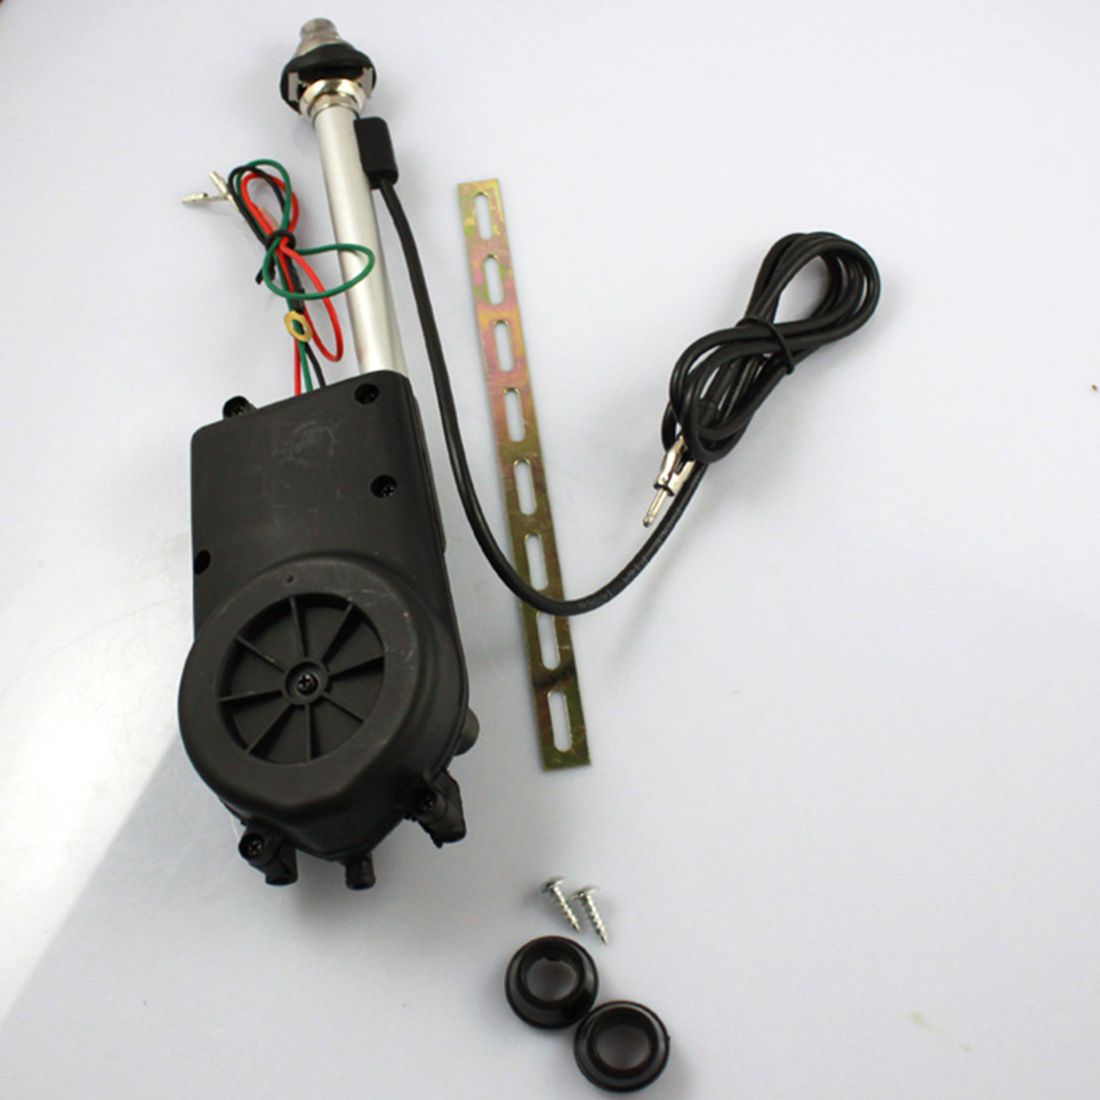 marsnaska universal car antenna electric power antenna replacement kit vehicle am fm radio mast aerial car accessories [ 1100 x 1100 Pixel ]